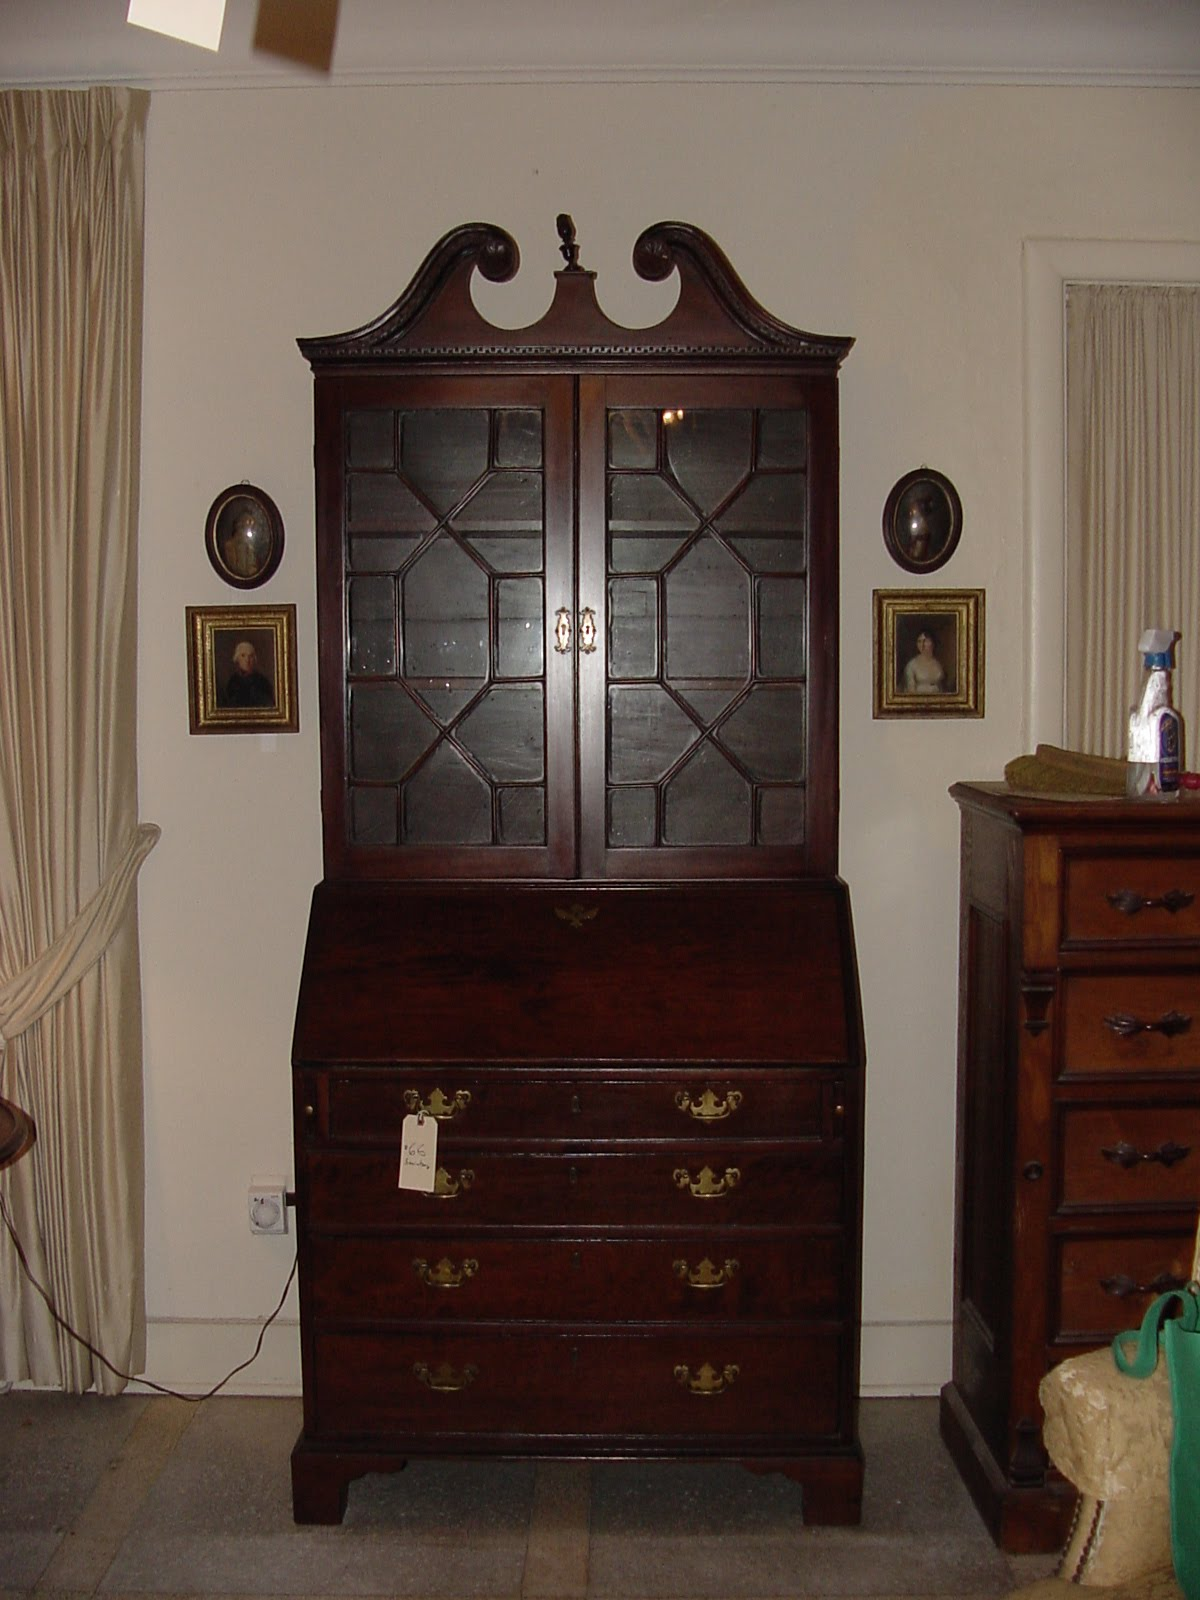 Antique Mahogany Secretary Desk Furniture - Mahogany Secretary Desk With Hutch Desk Design Ideas